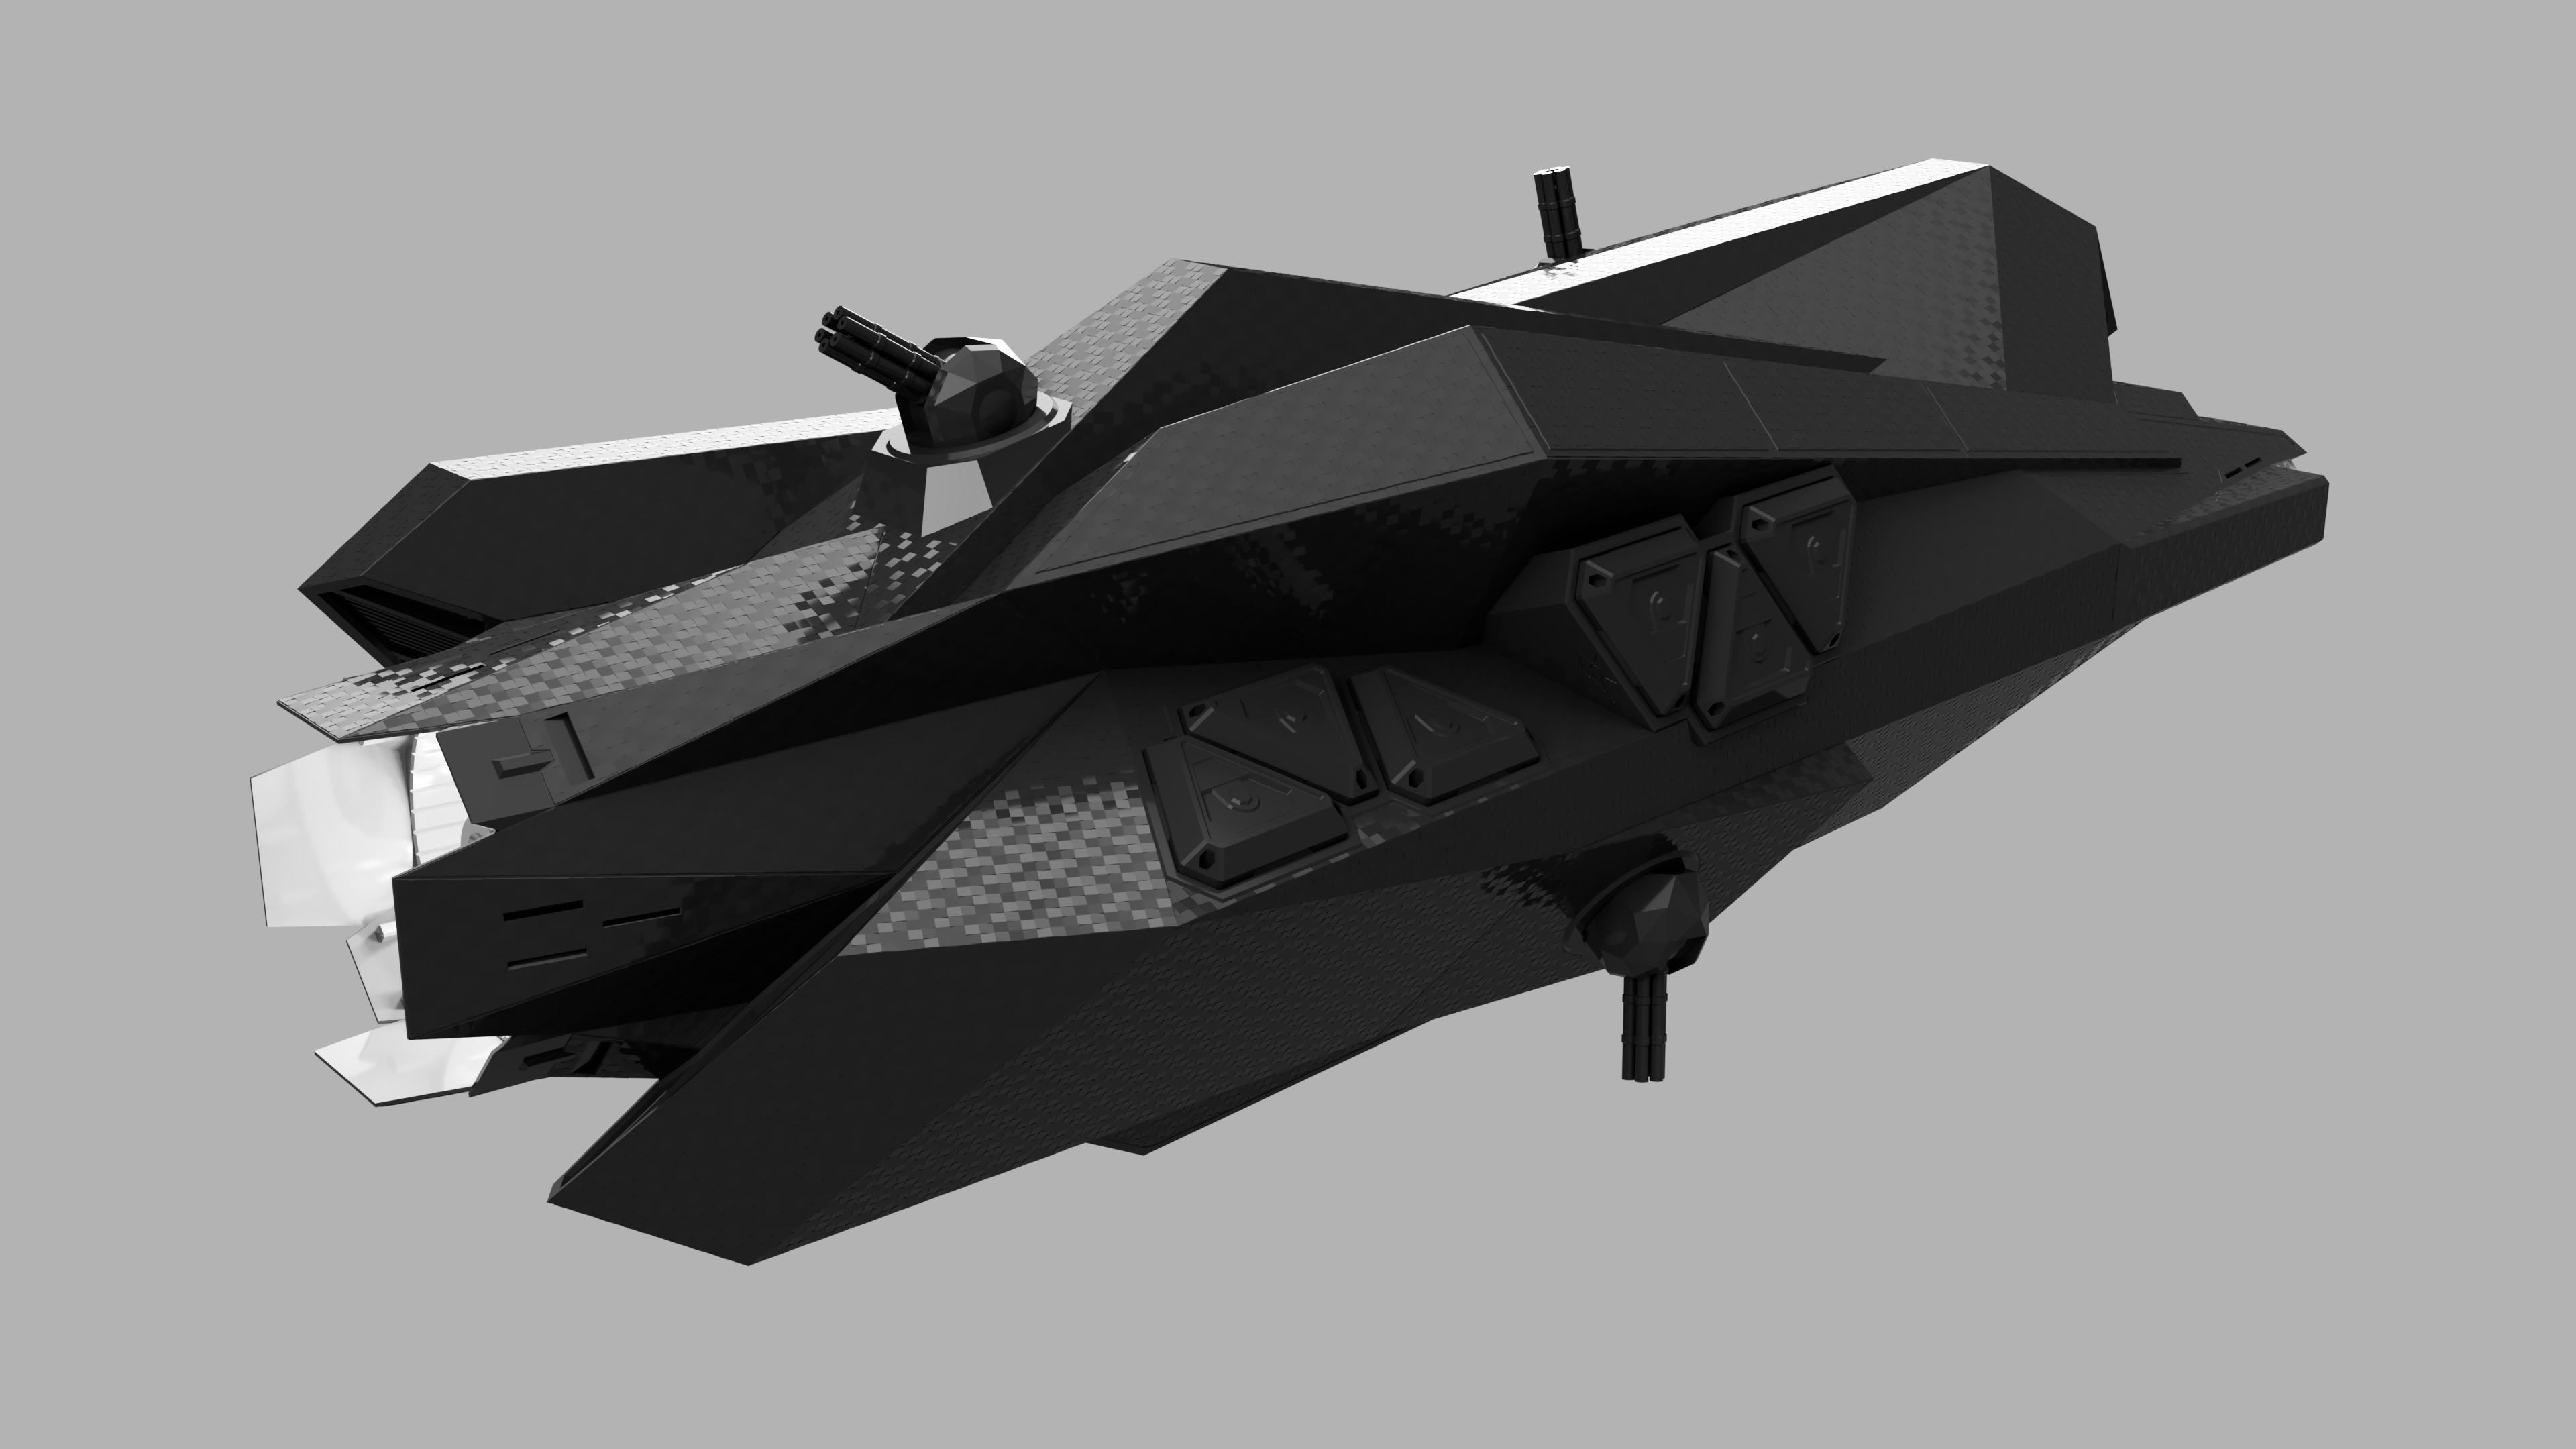 Anubis_2020-Nov-21_06-30-45PM-000_CustomizedView10688312800.png Download STL file Anubis • 3D print template, sergusy